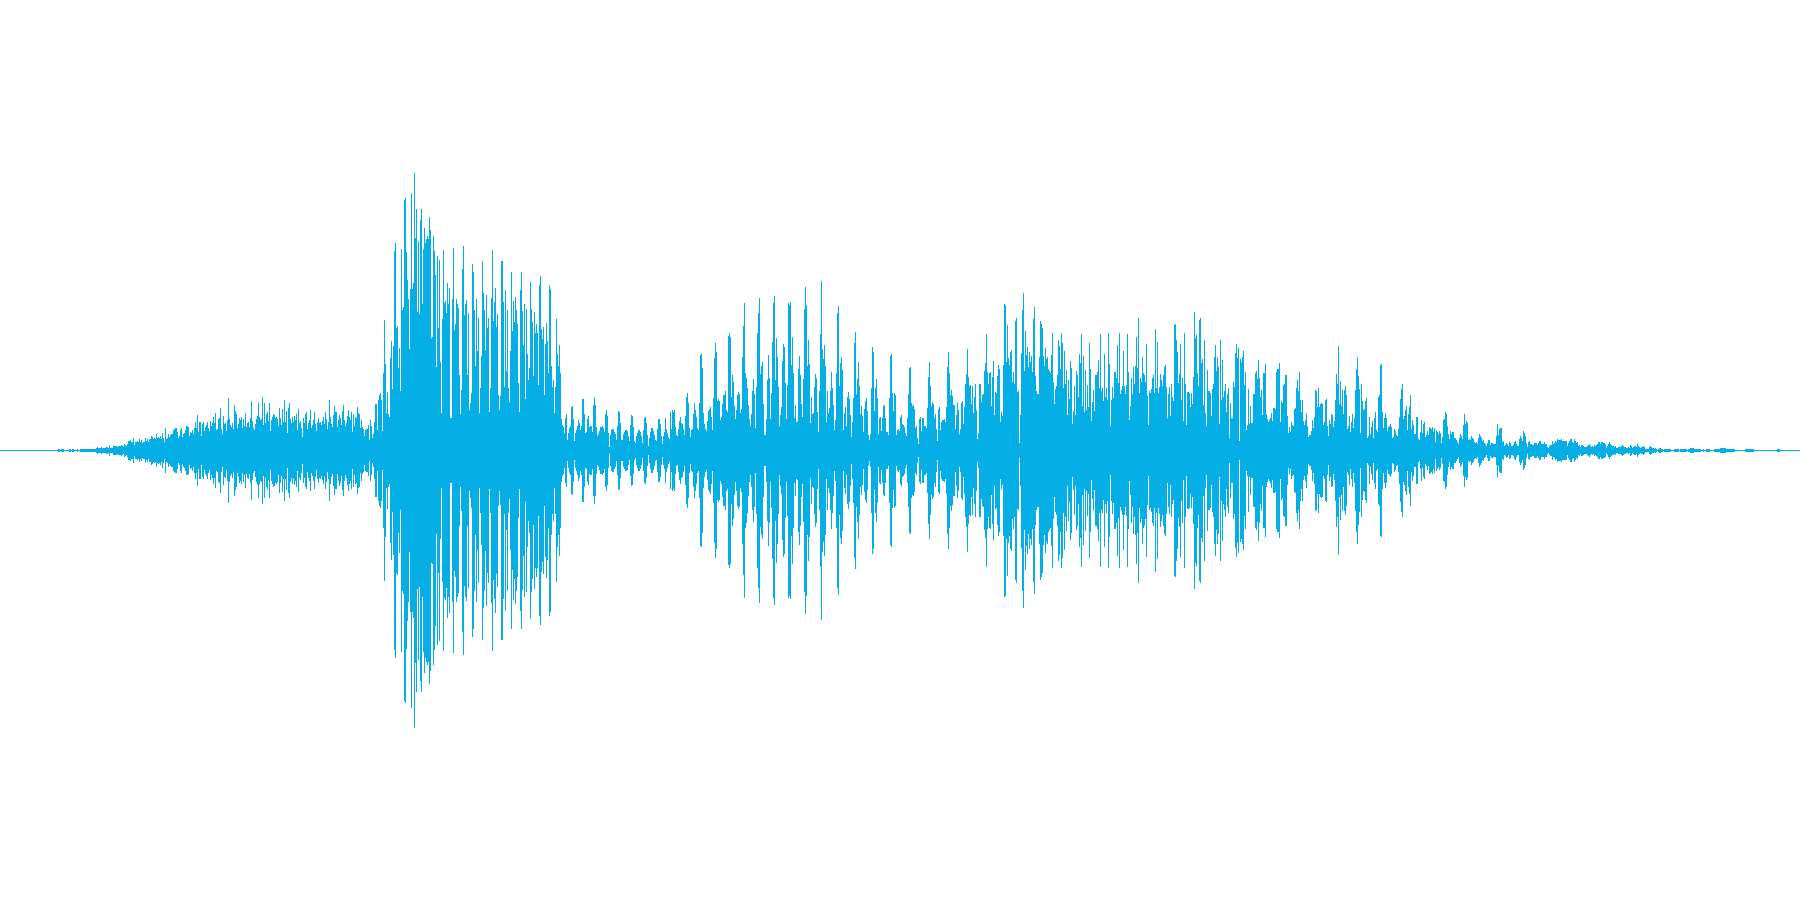 「February」英語発音の再生済みの波形